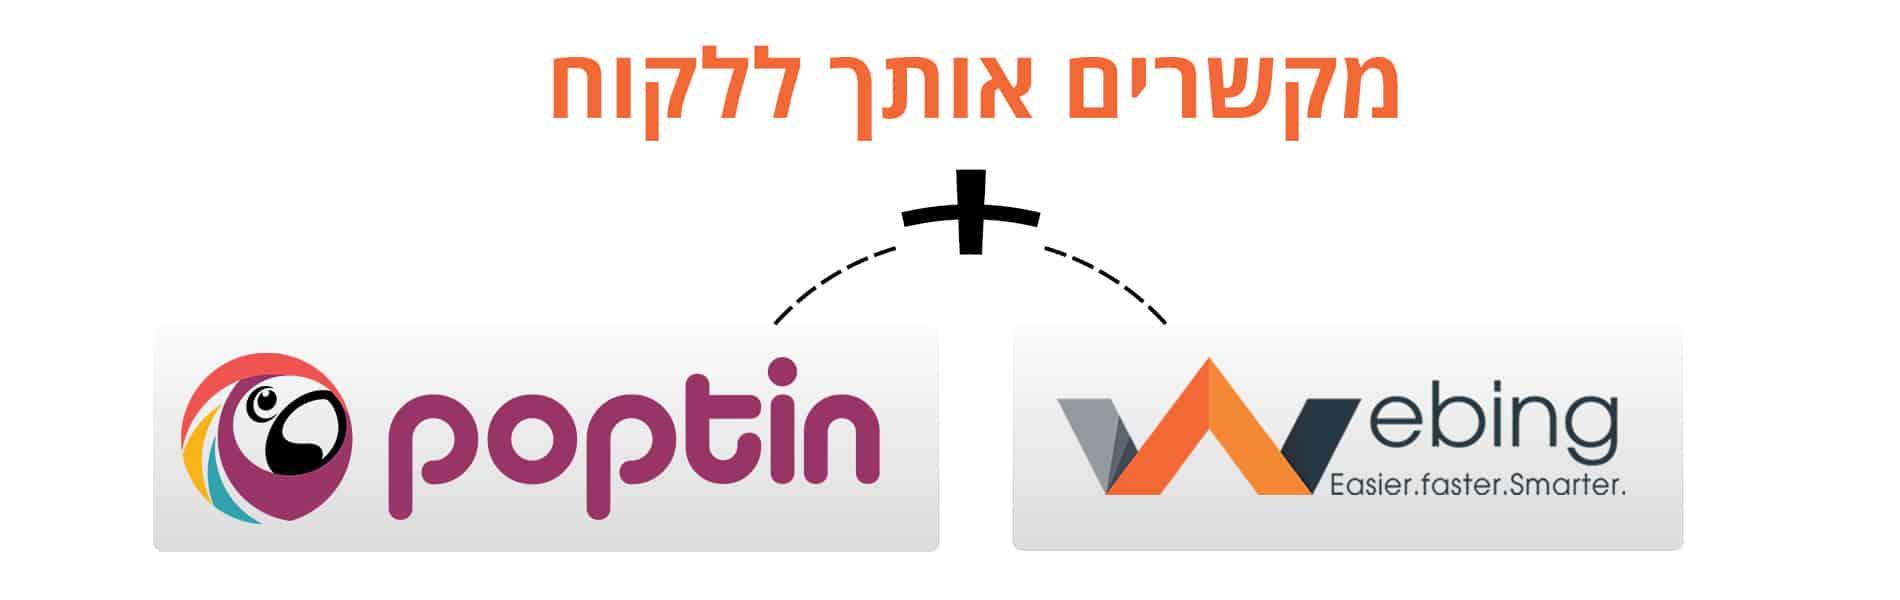 אינטגרציה עם poptin פופטין וובינג בניית אתר וורדפרס בקליק webing